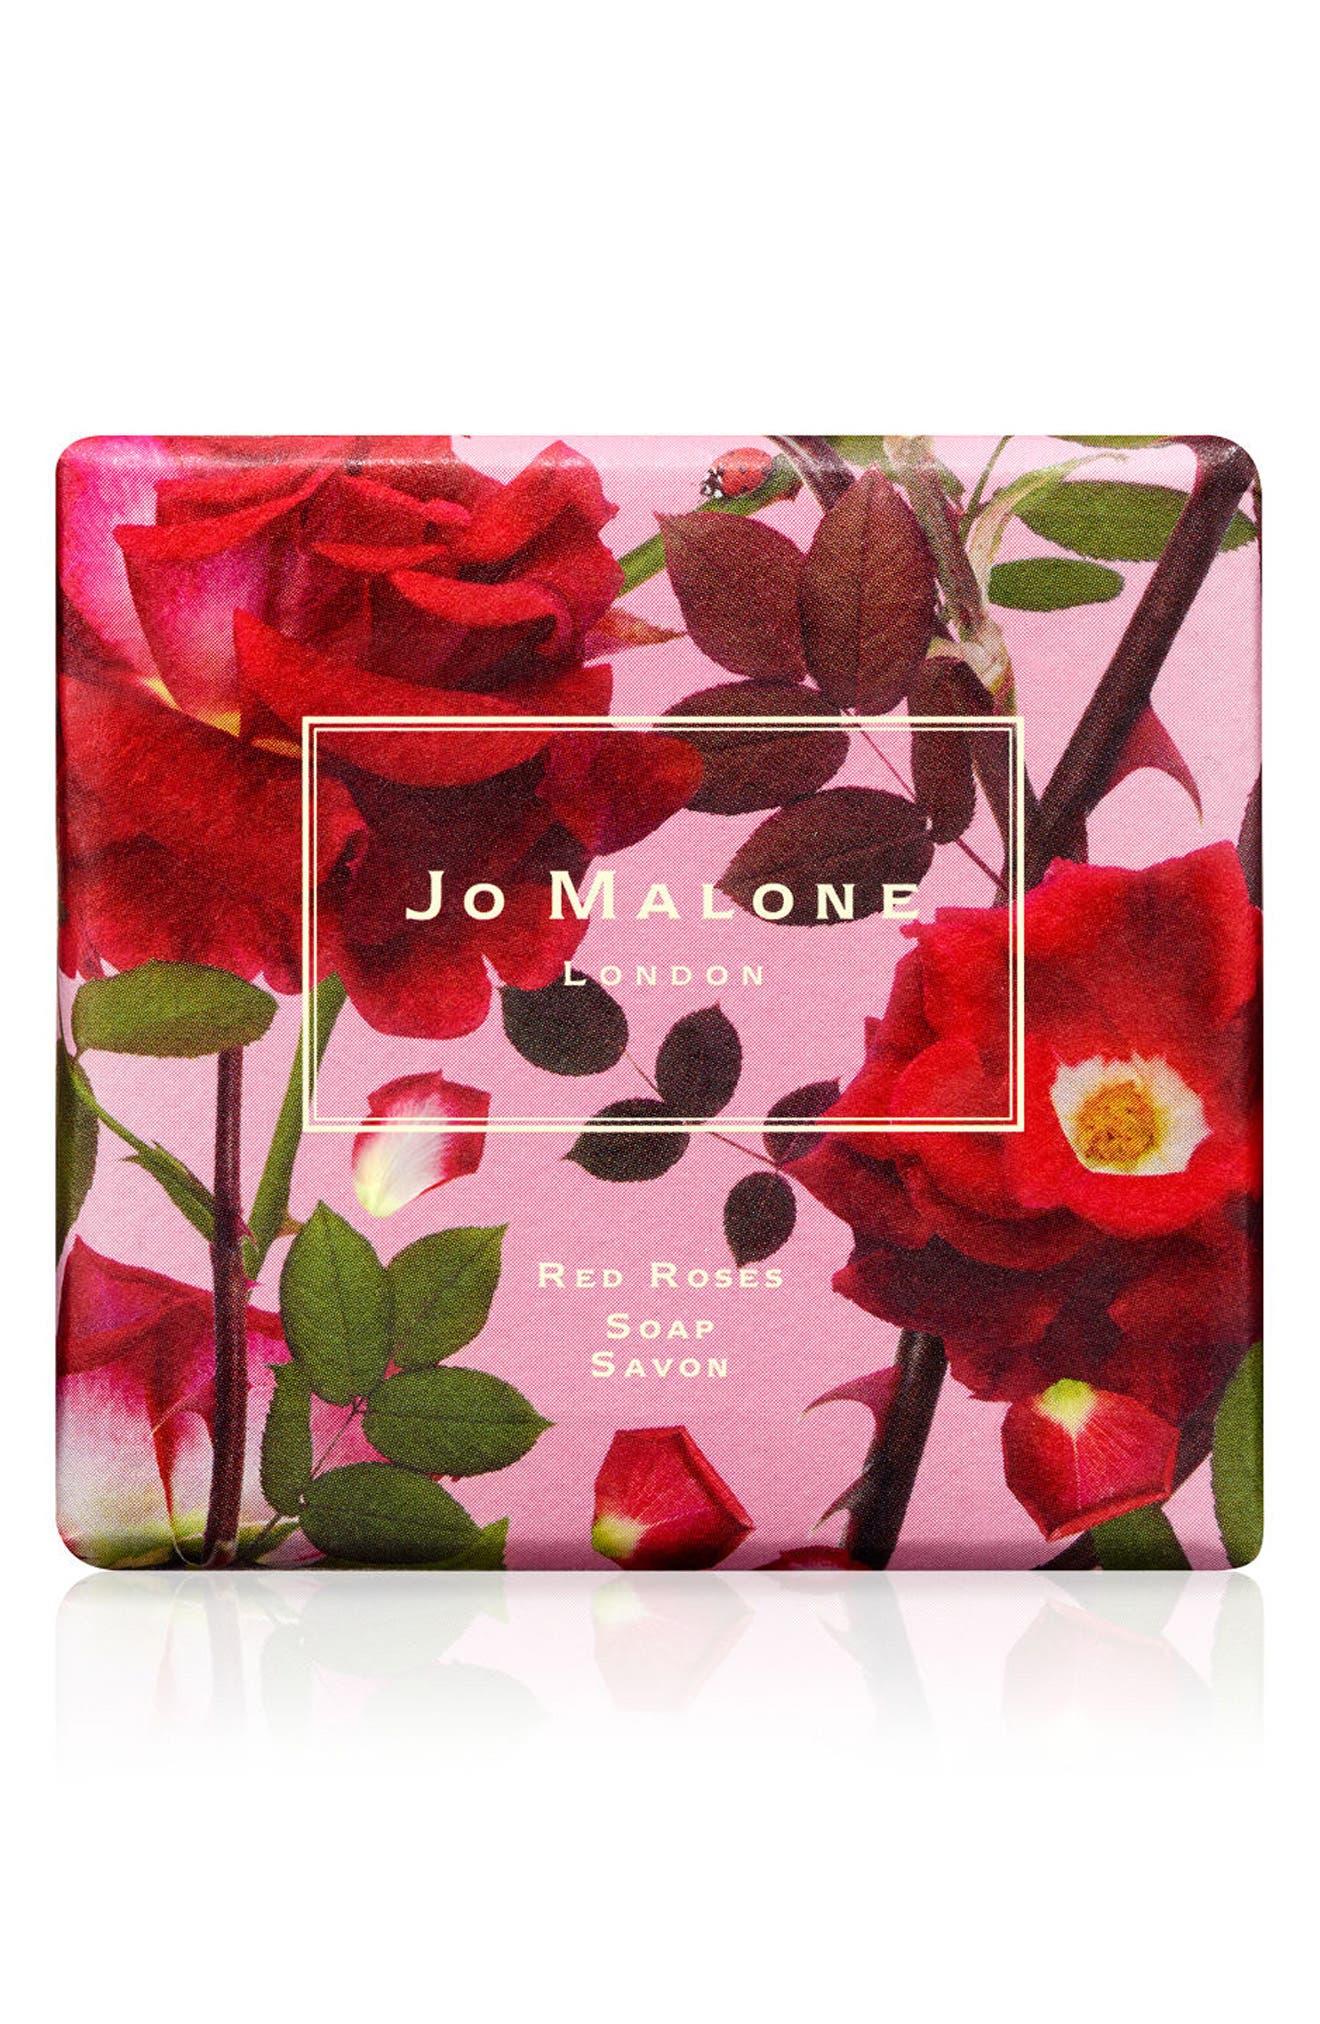 Jo Malone London(TM) Red Roses Soap